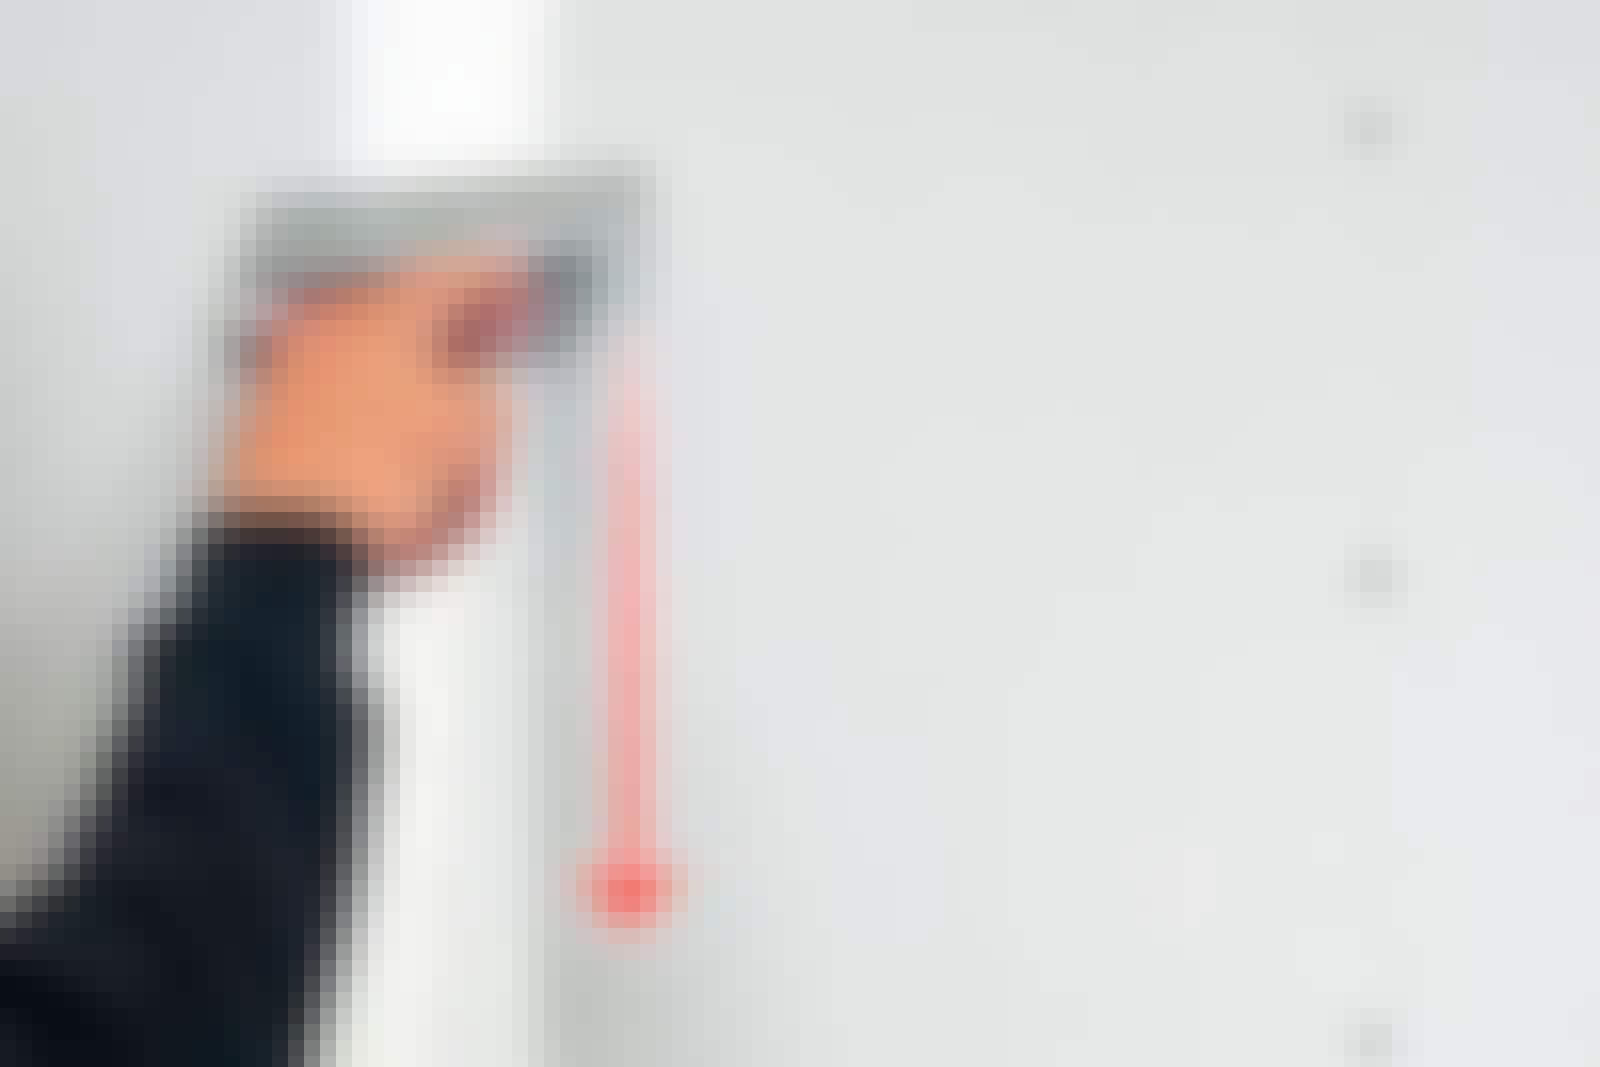 Spackel: Hur länge ska spackel torka?